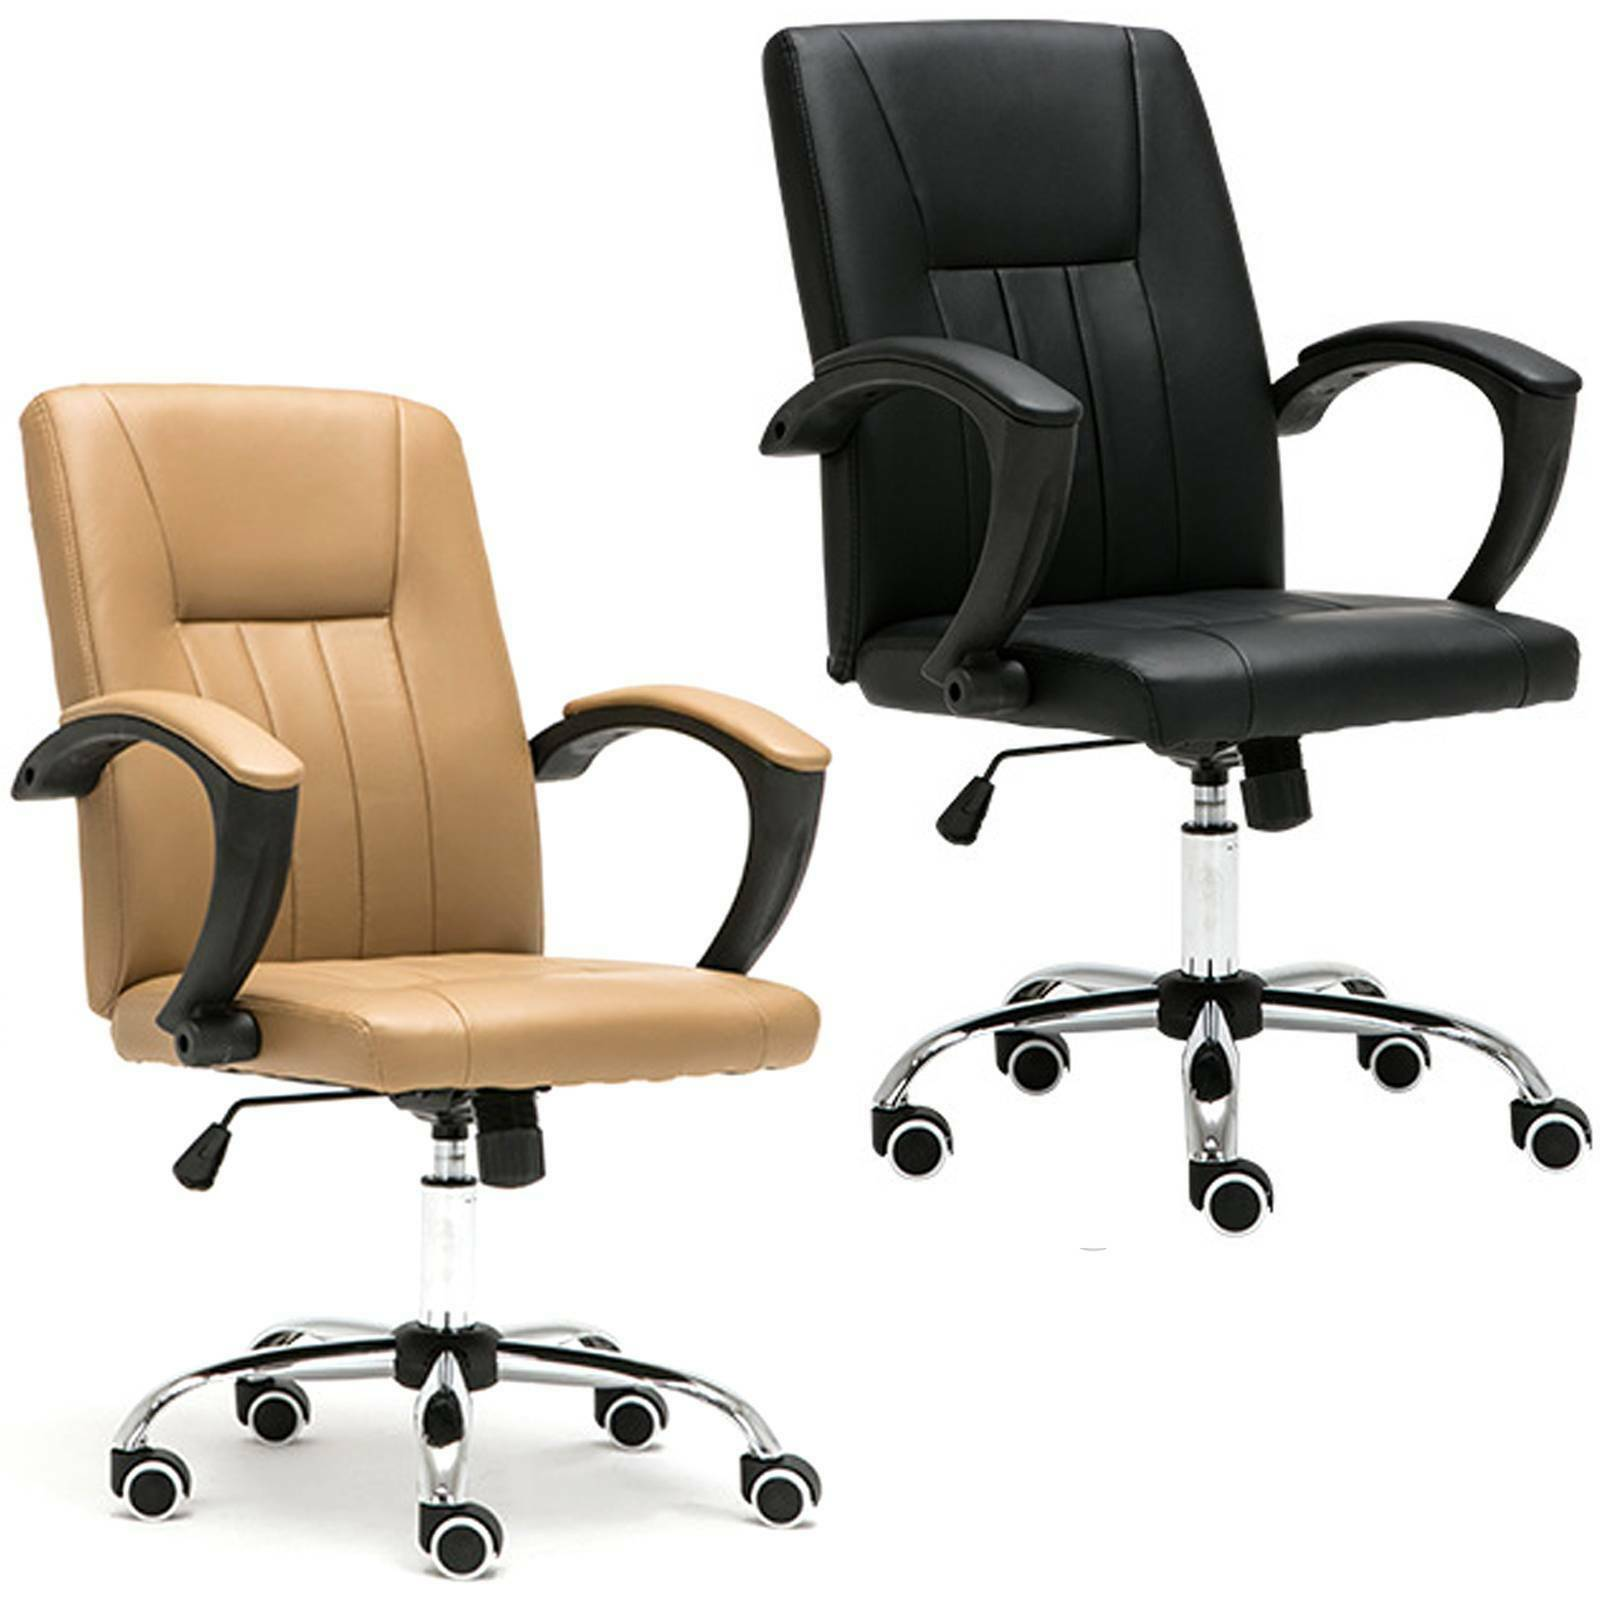 Vintage British Design Corp Bent Oak Wood Brown Kneeling Chair Ergonomic Office For Sale Ebay